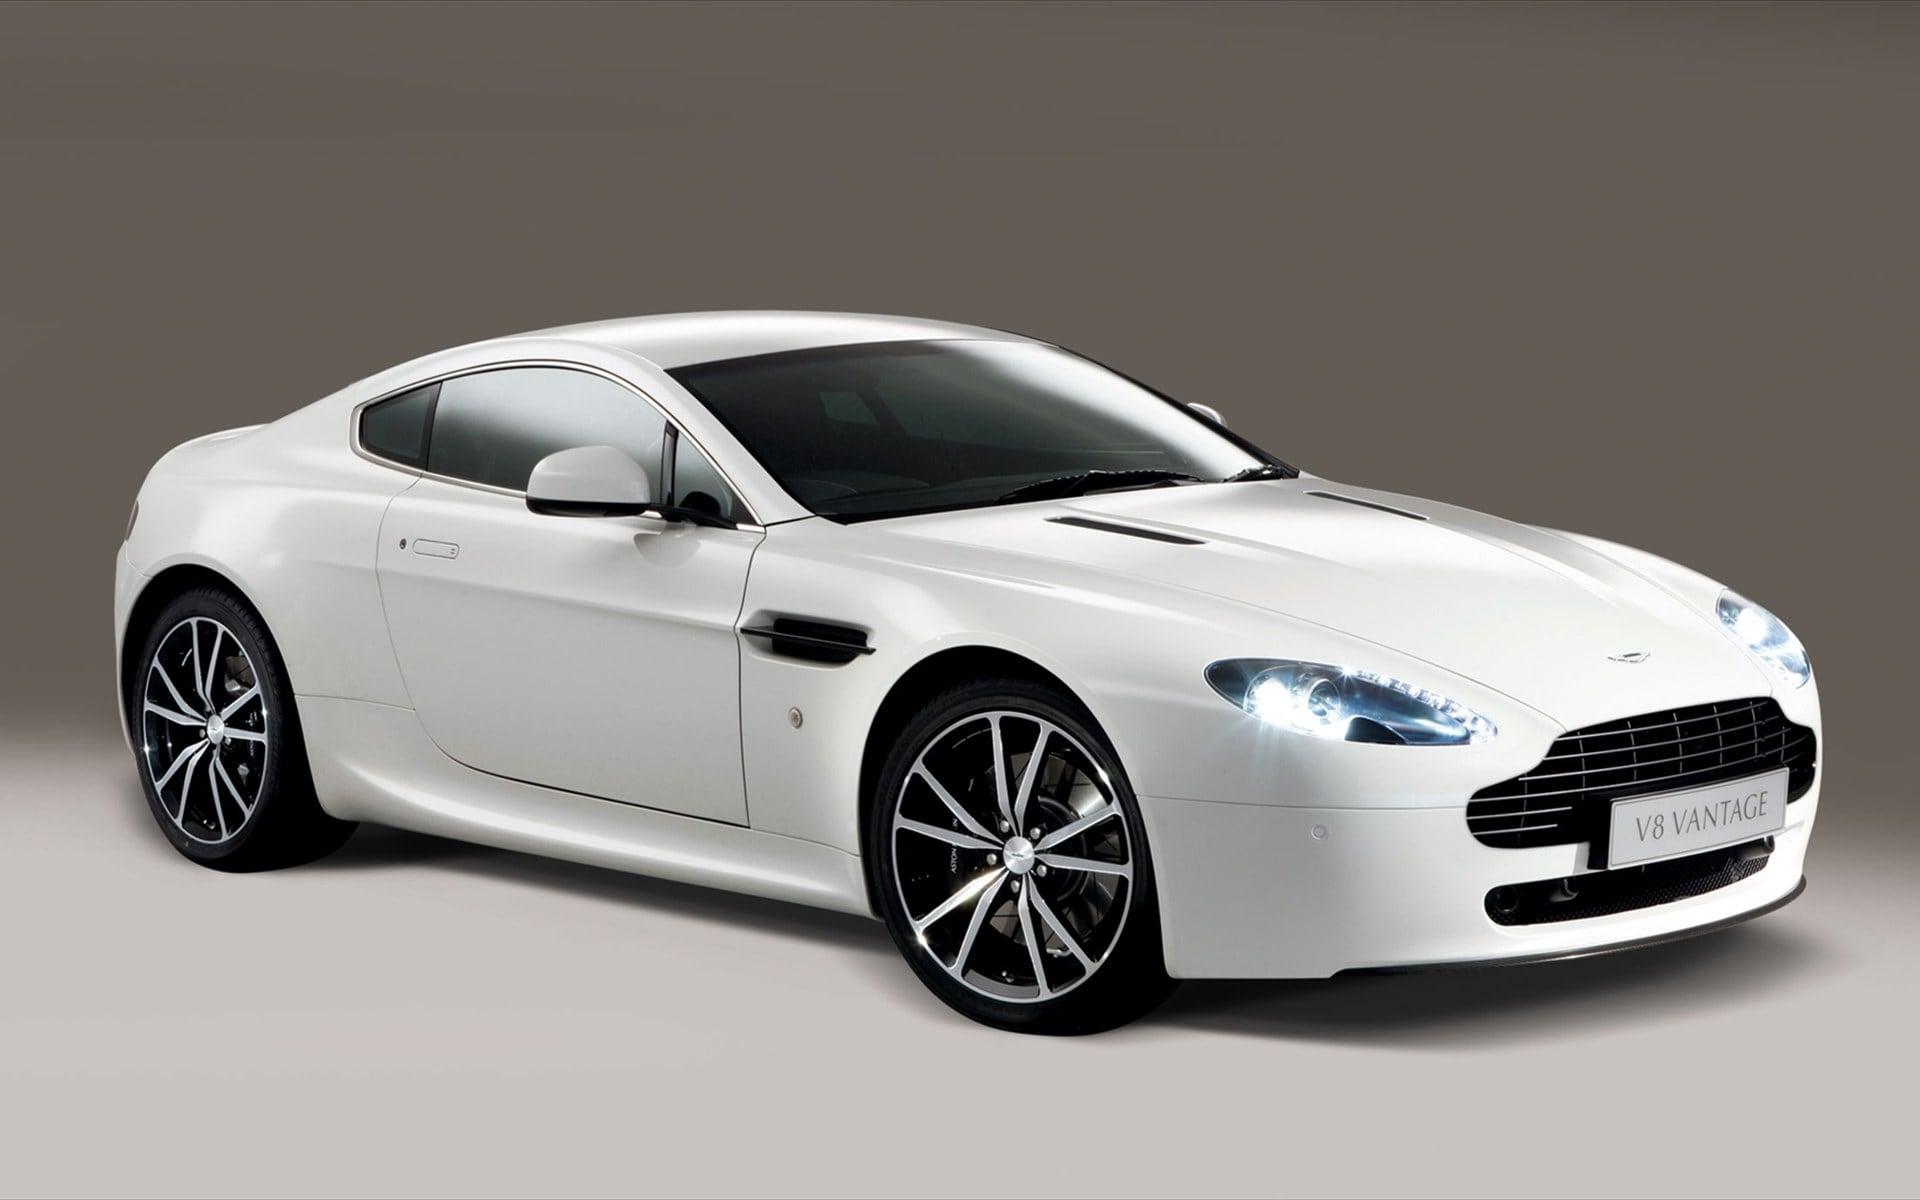 2006 Aston Martin V8 Vantage Free